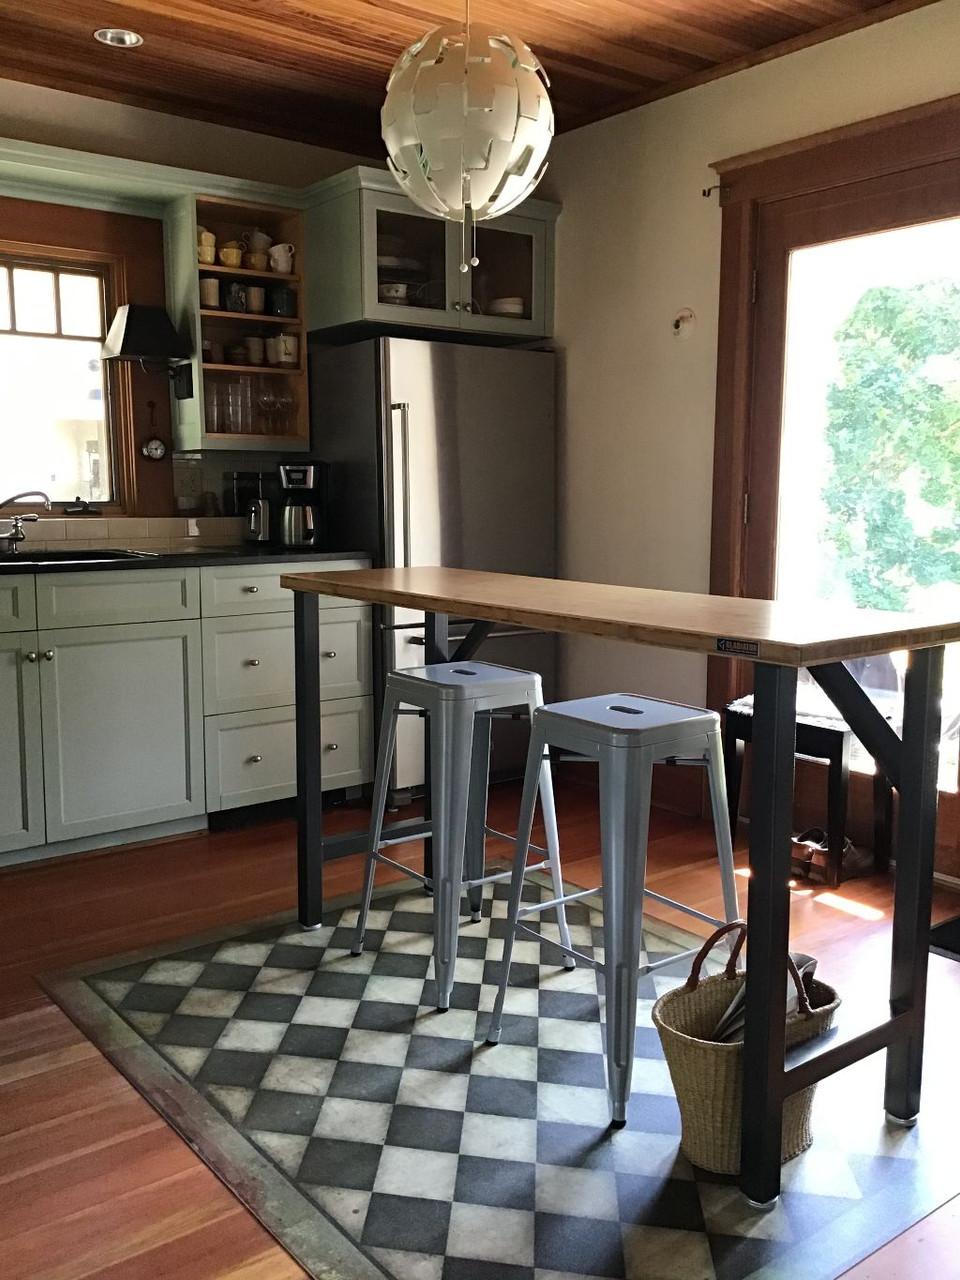 Pura Vida customer use of checkmate vinyl floor cloth